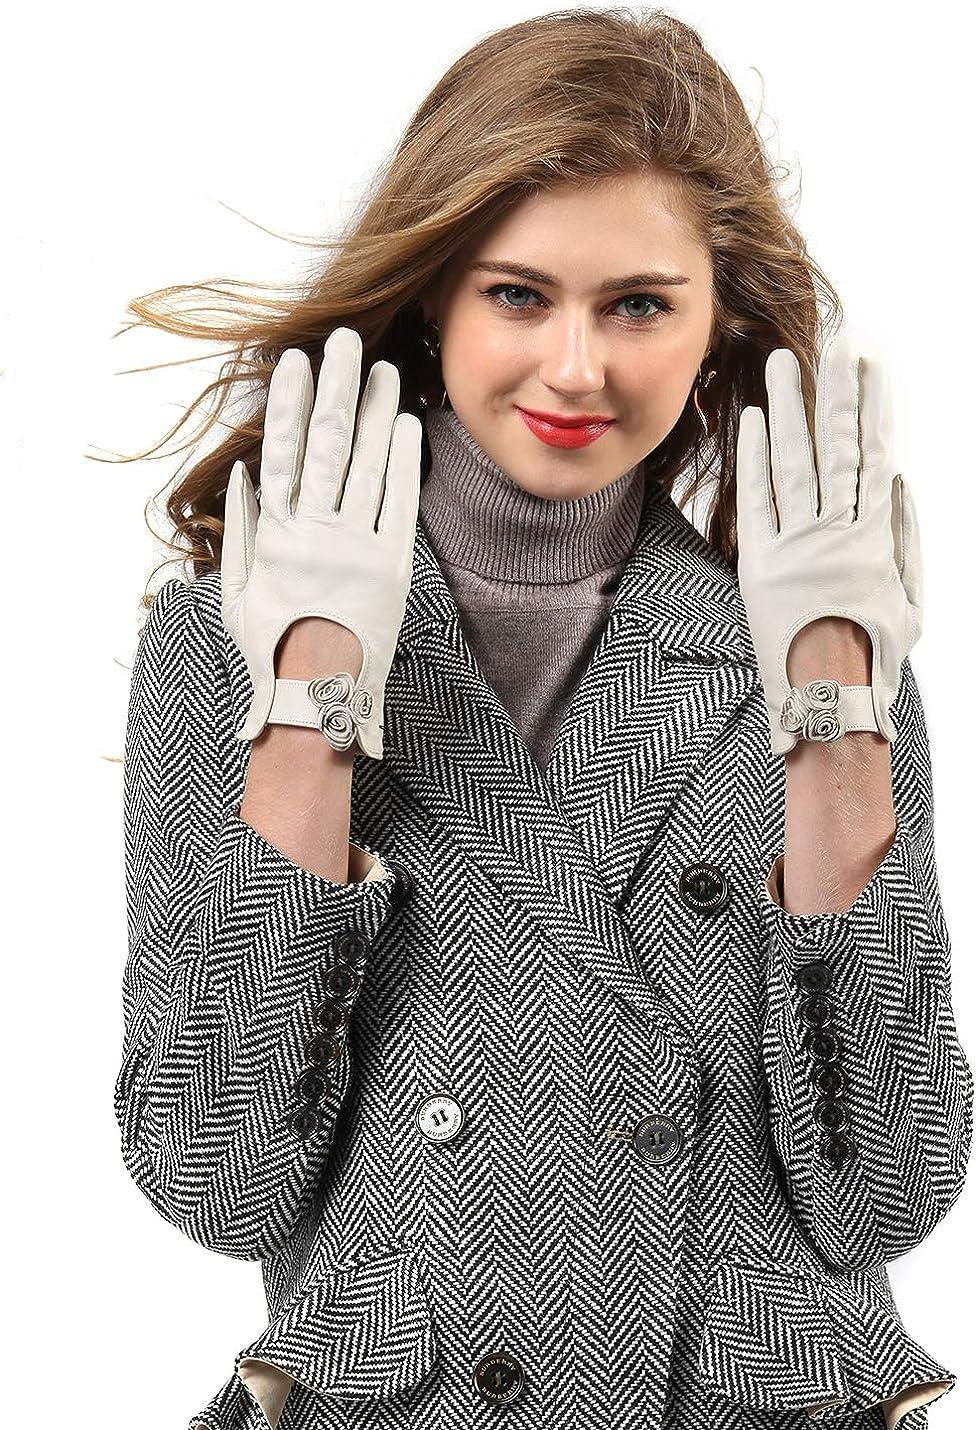 YISEVEN Women's Touchscreen Sheepskin Leather Gloves White Bow